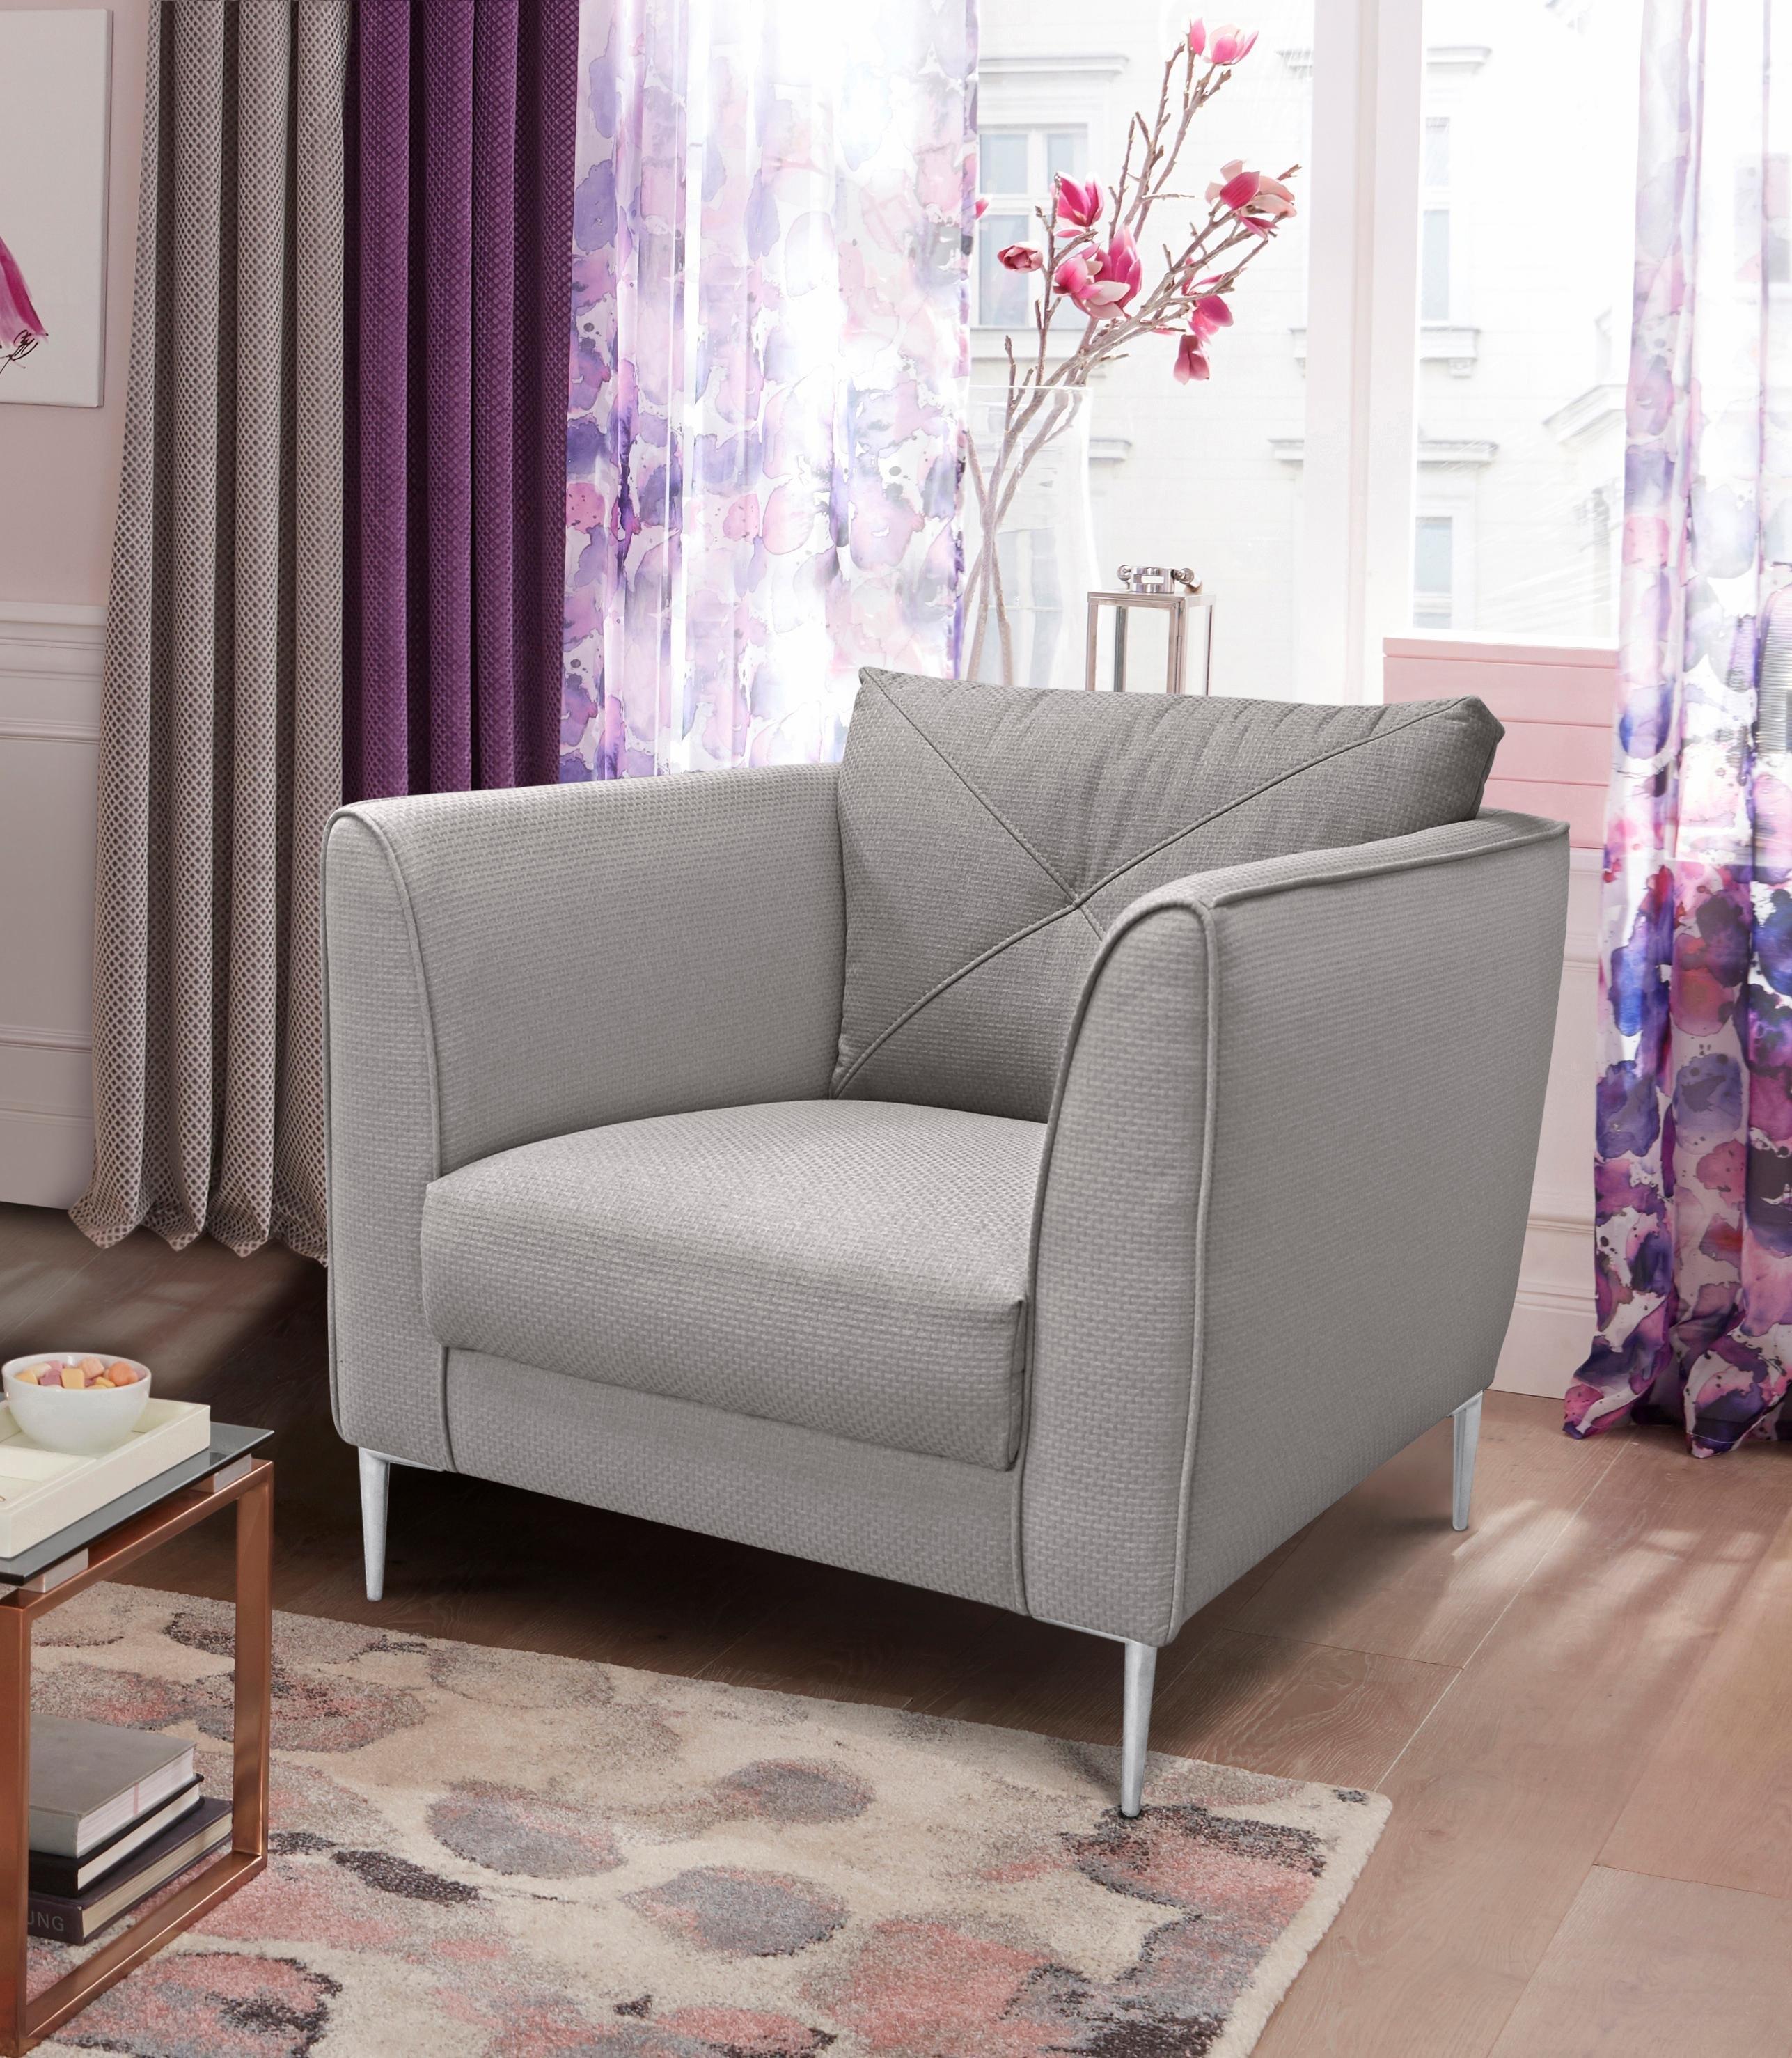 Guido Maria Kretschmer Home & Living GMK Home & Living fauteuil »Lille« in de webshop van OTTO kopen